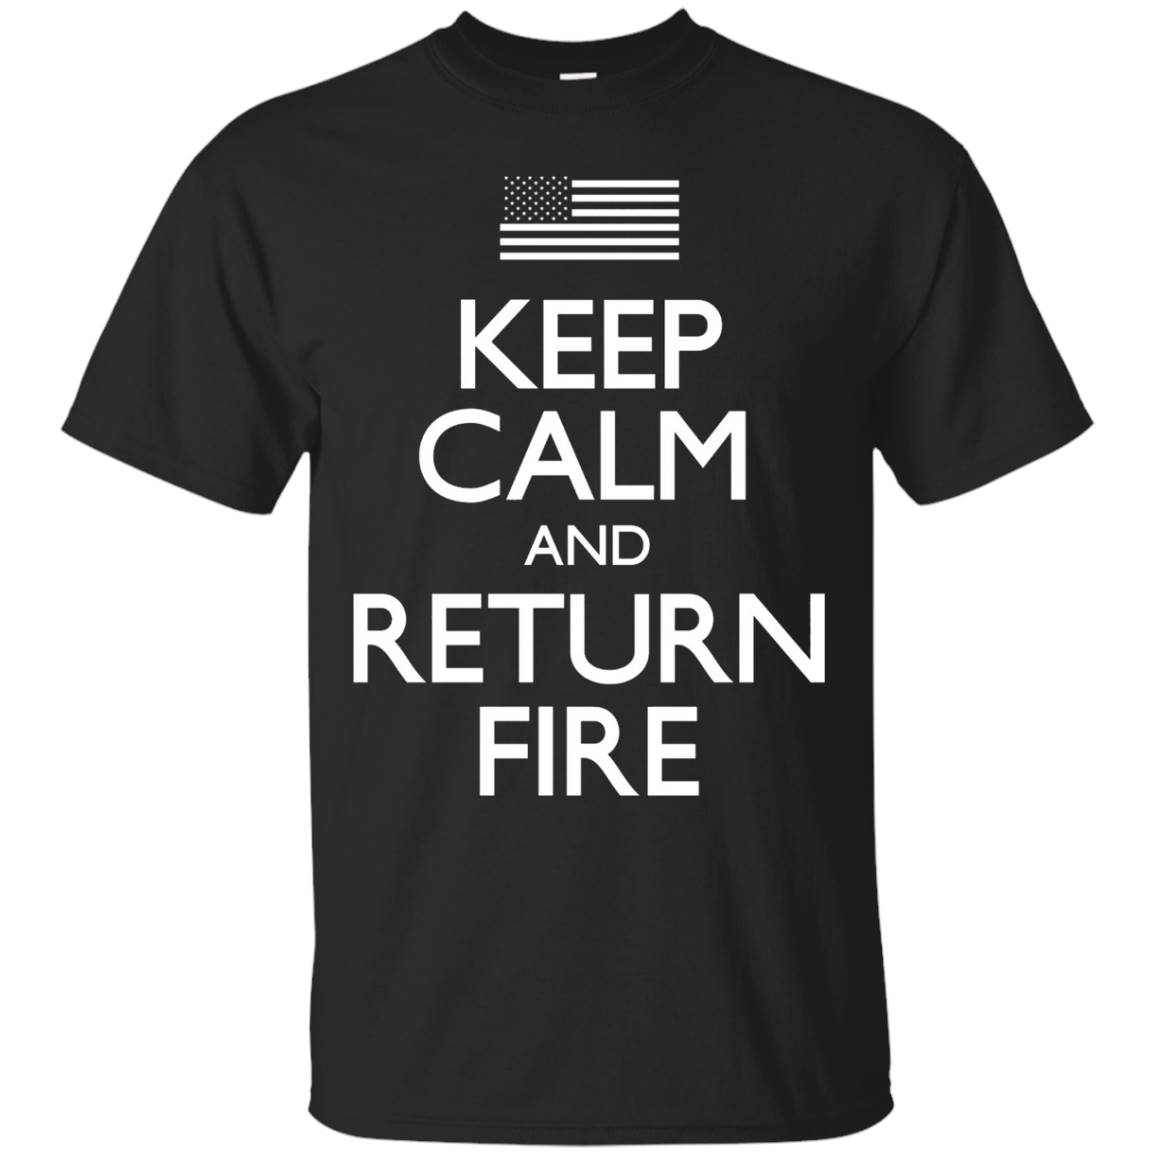 Keep Calm and Return Fire 2nd Amendment T-Shirt